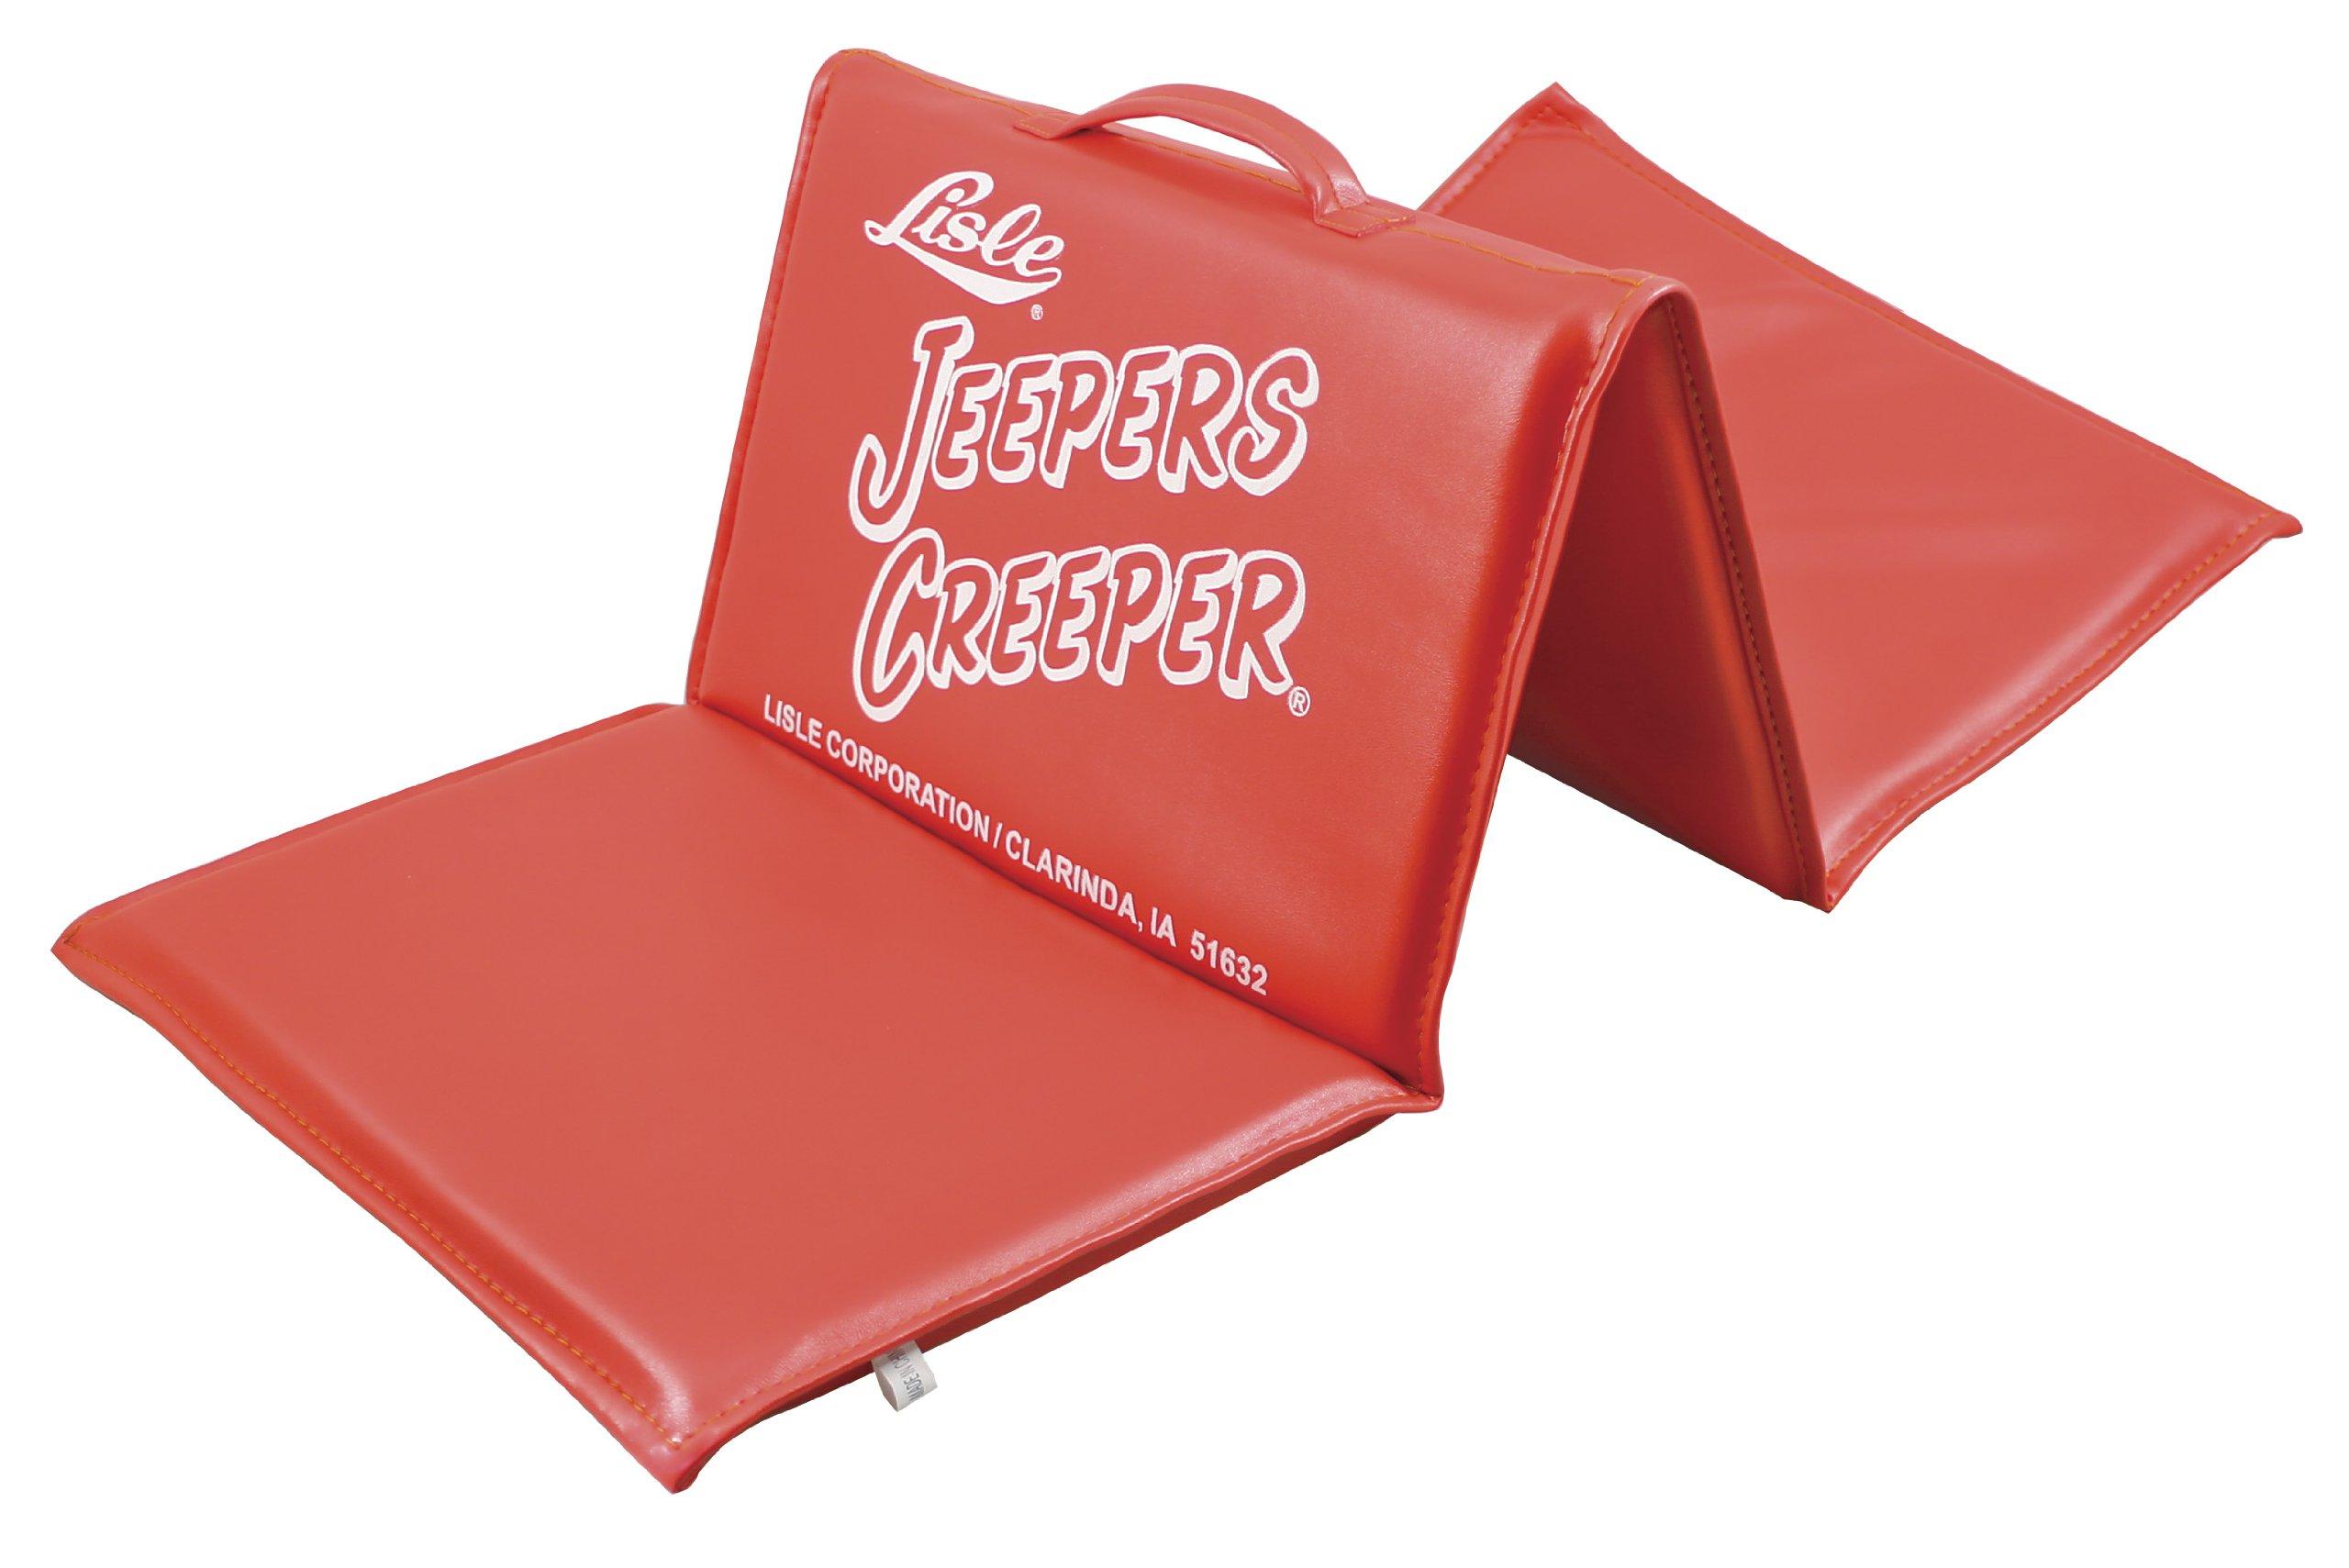 Lisle 95002 Fold-Up Creeper by Lisle